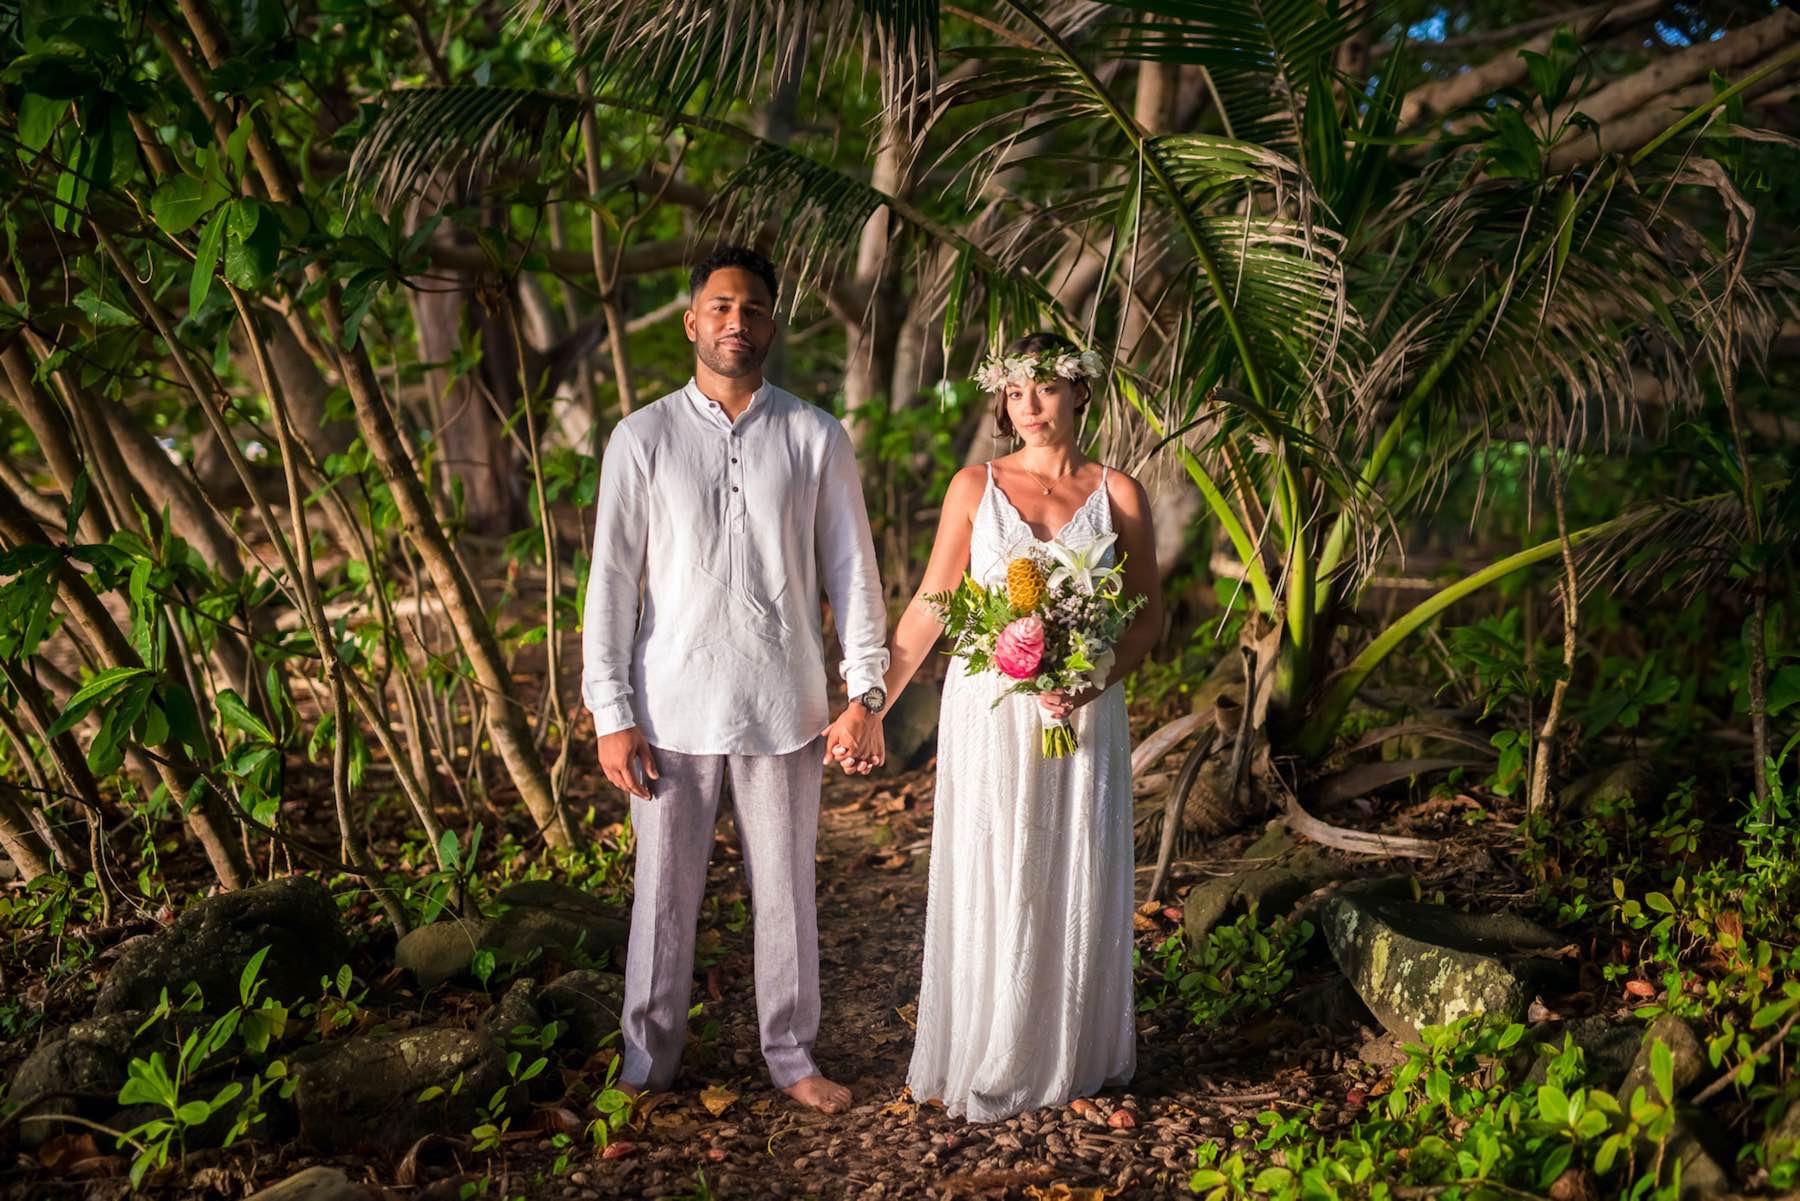 Erin & Zack getting married in Hawaii.